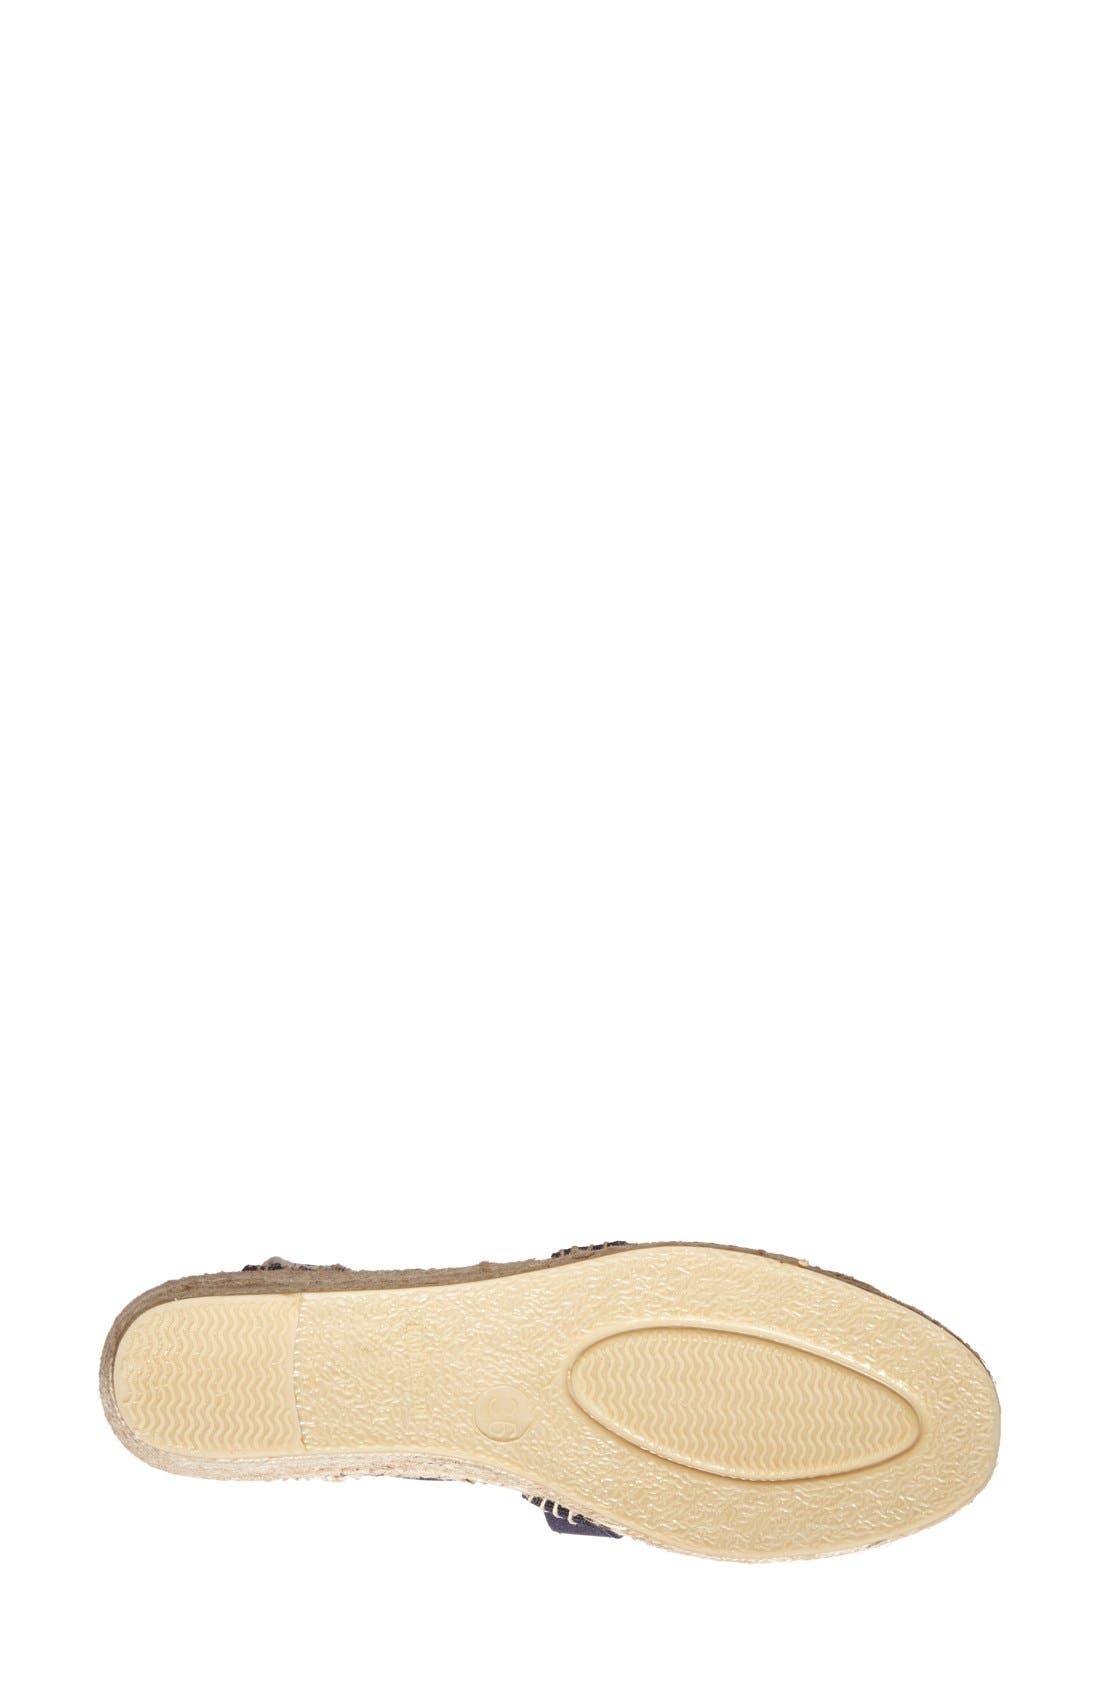 'Tarbes' Espadrille Wedge Sandal,                             Alternate thumbnail 3, color,                             BLUE